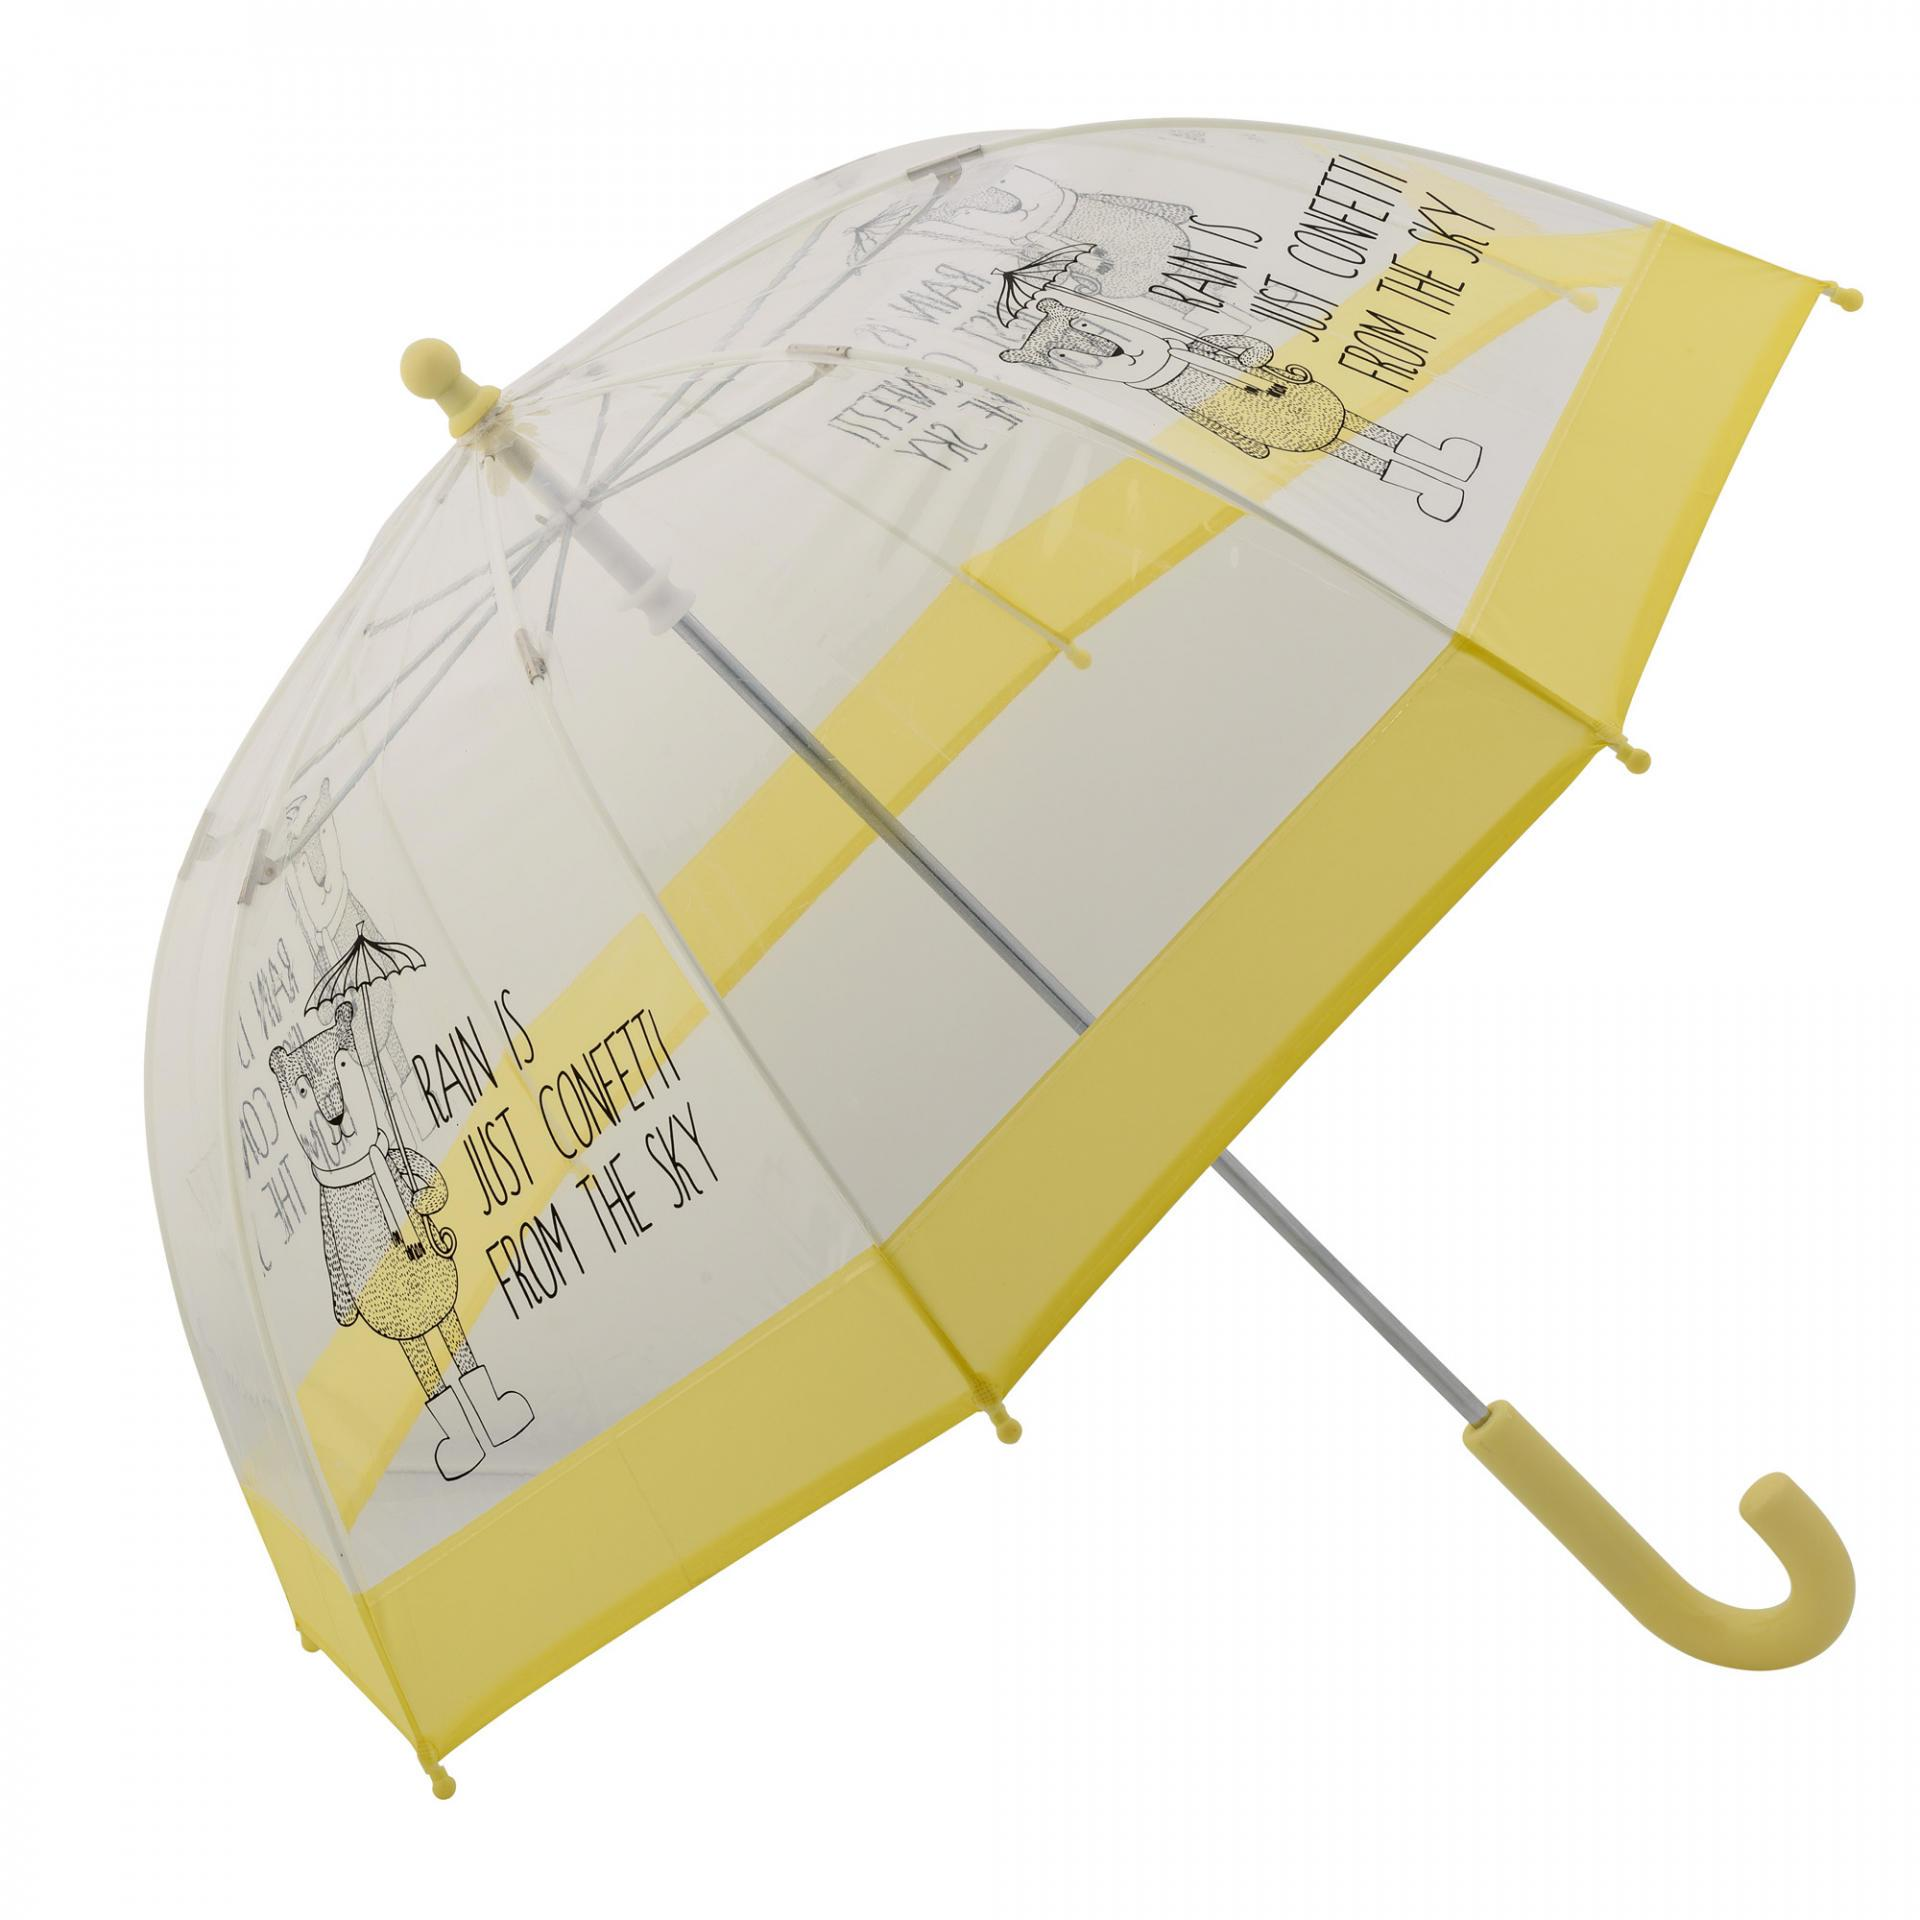 Bloomingville Dětský deštník Yellow, žlutá barva, čirá barva, plast